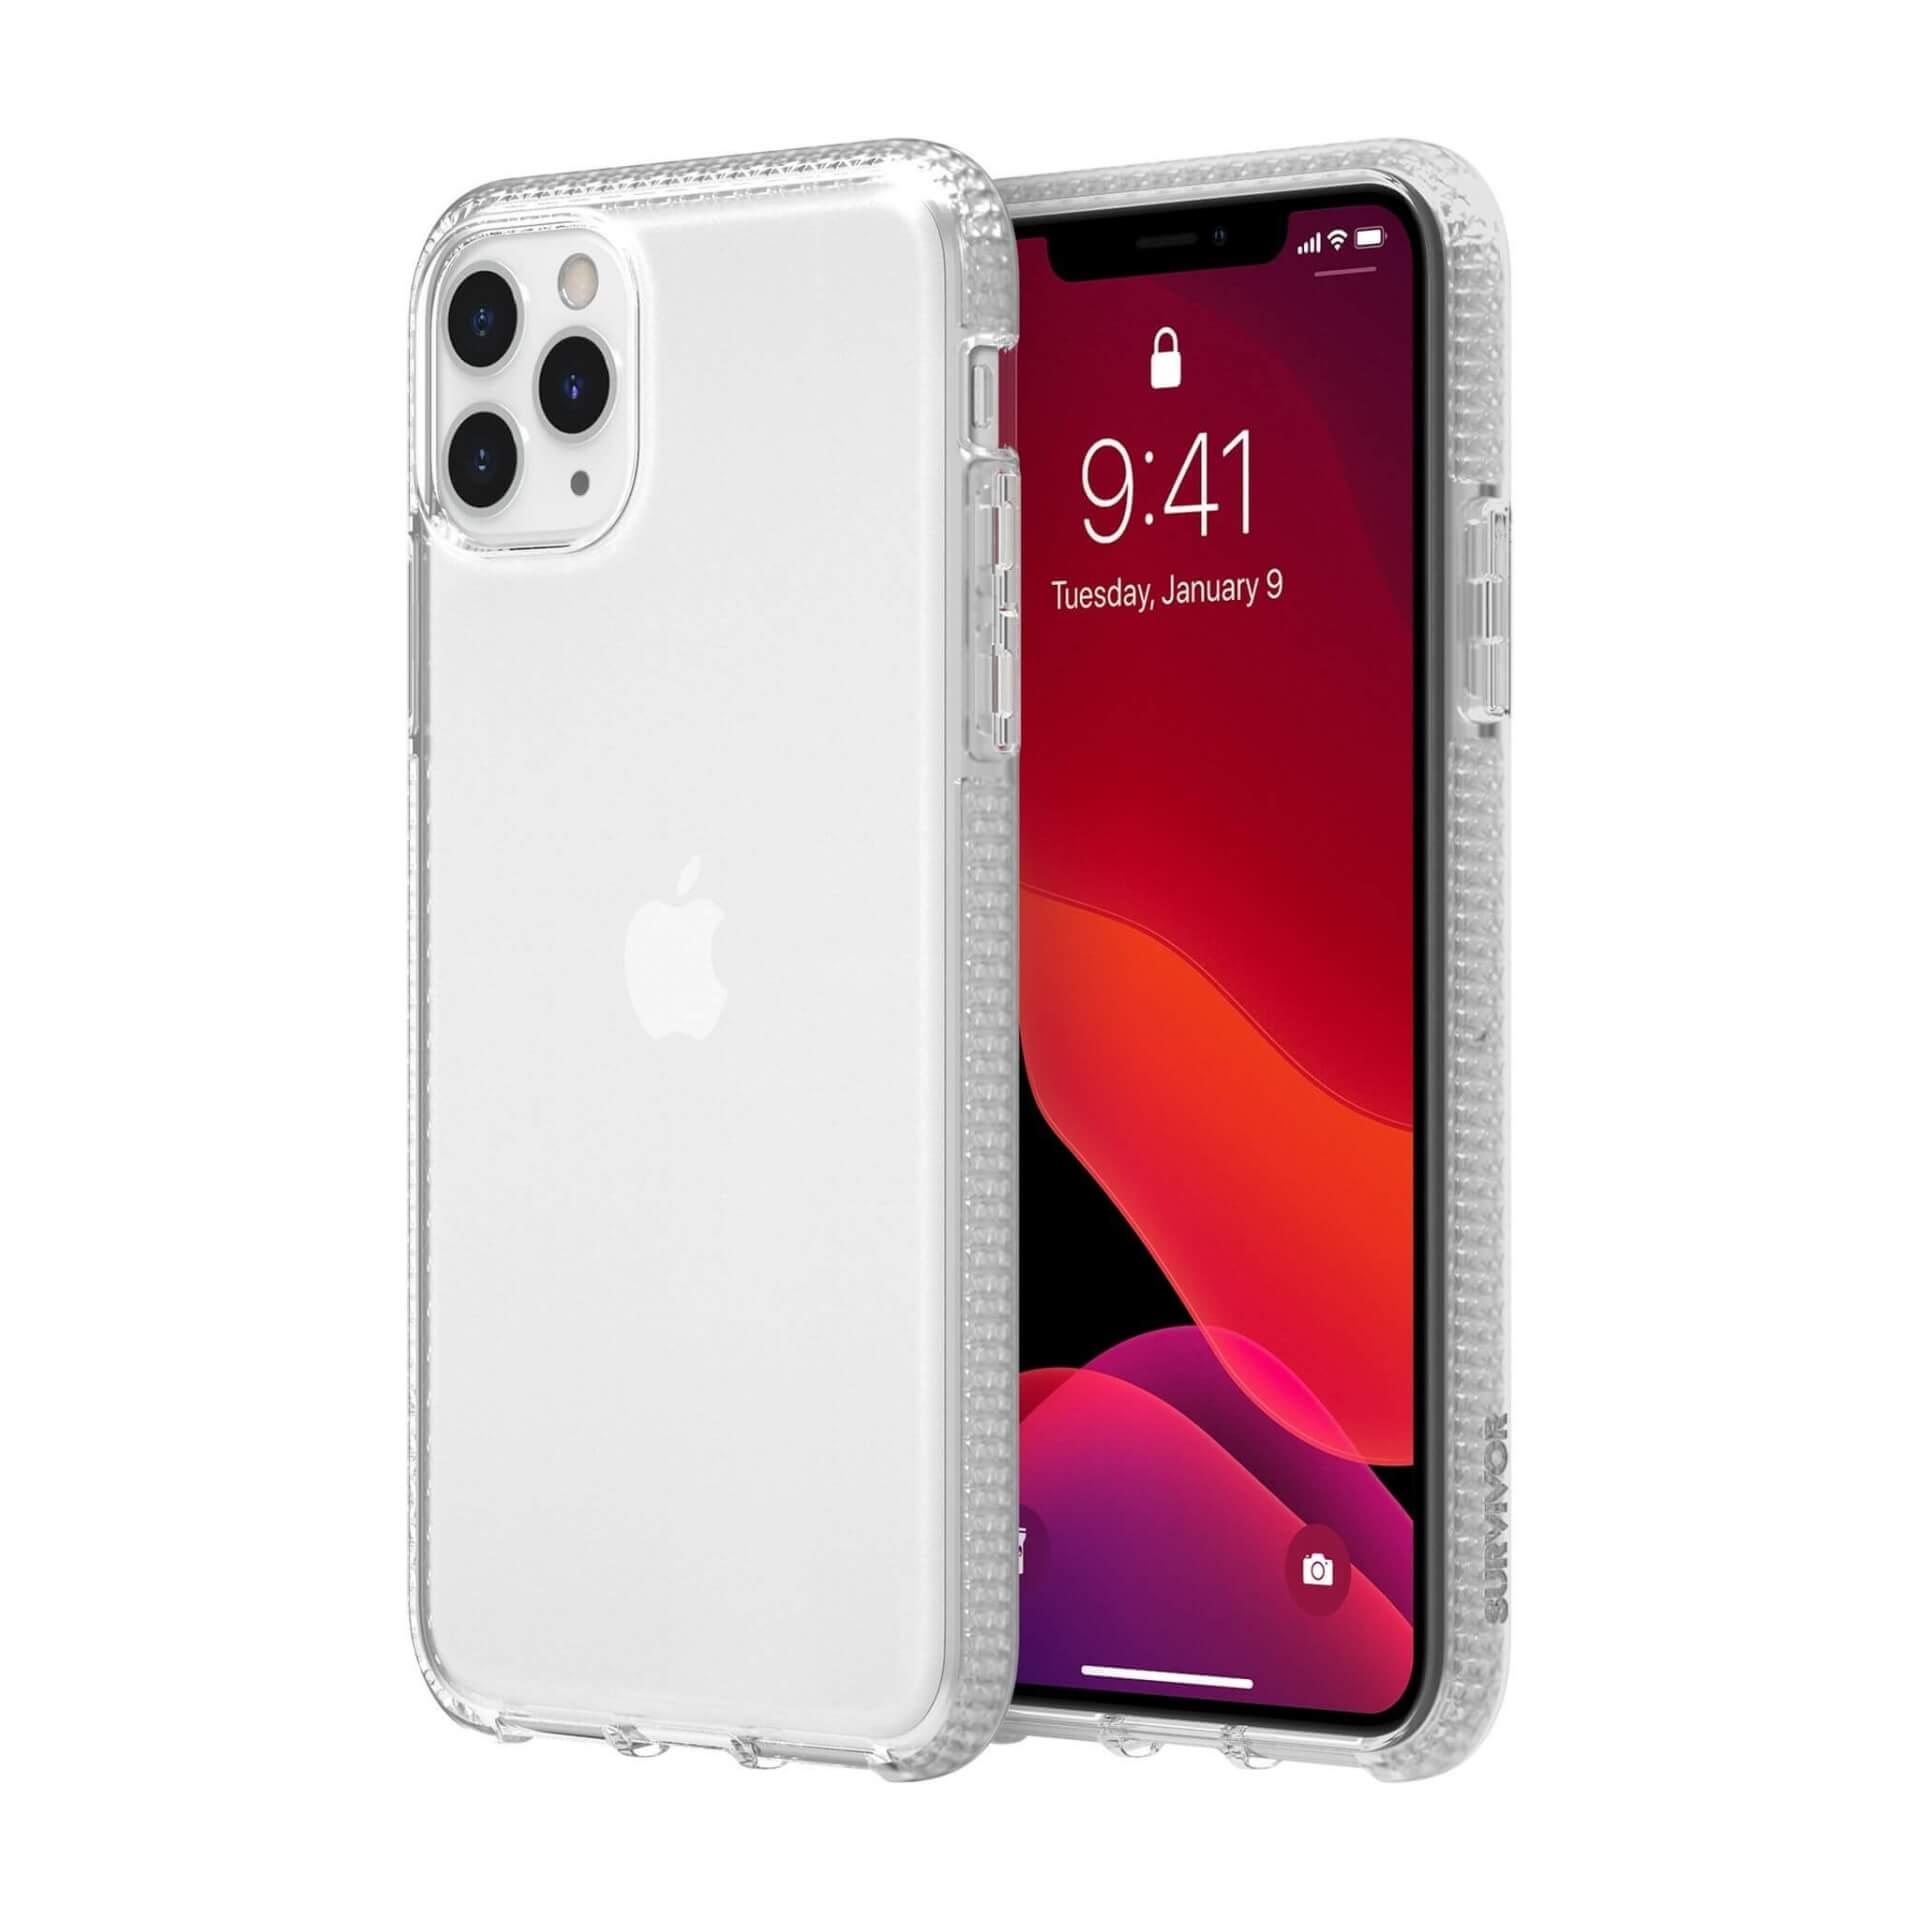 Griffin Survivor Clear Case — хибриден удароустойчив кейс за iPhone 11 Pro (прозрачен) - 4